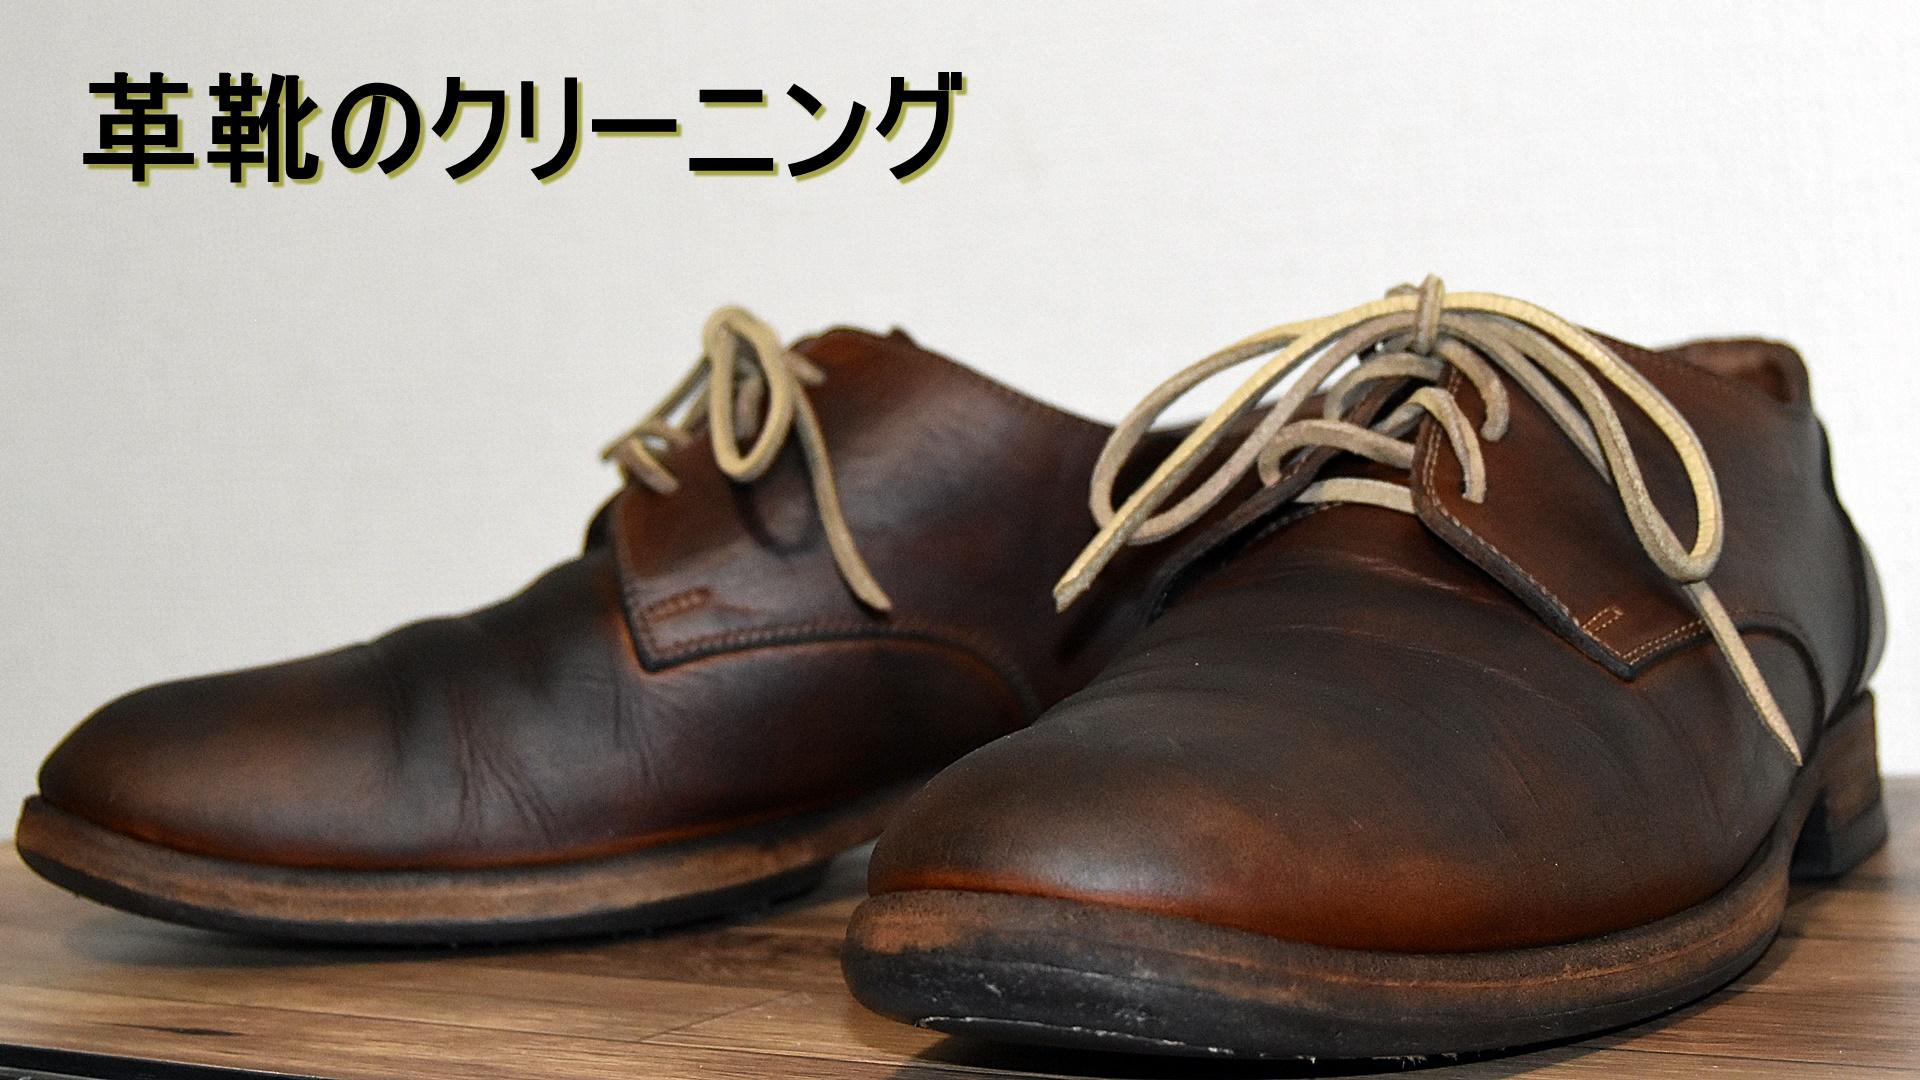 Leather Arts & Crafts MOTO 丸洗い